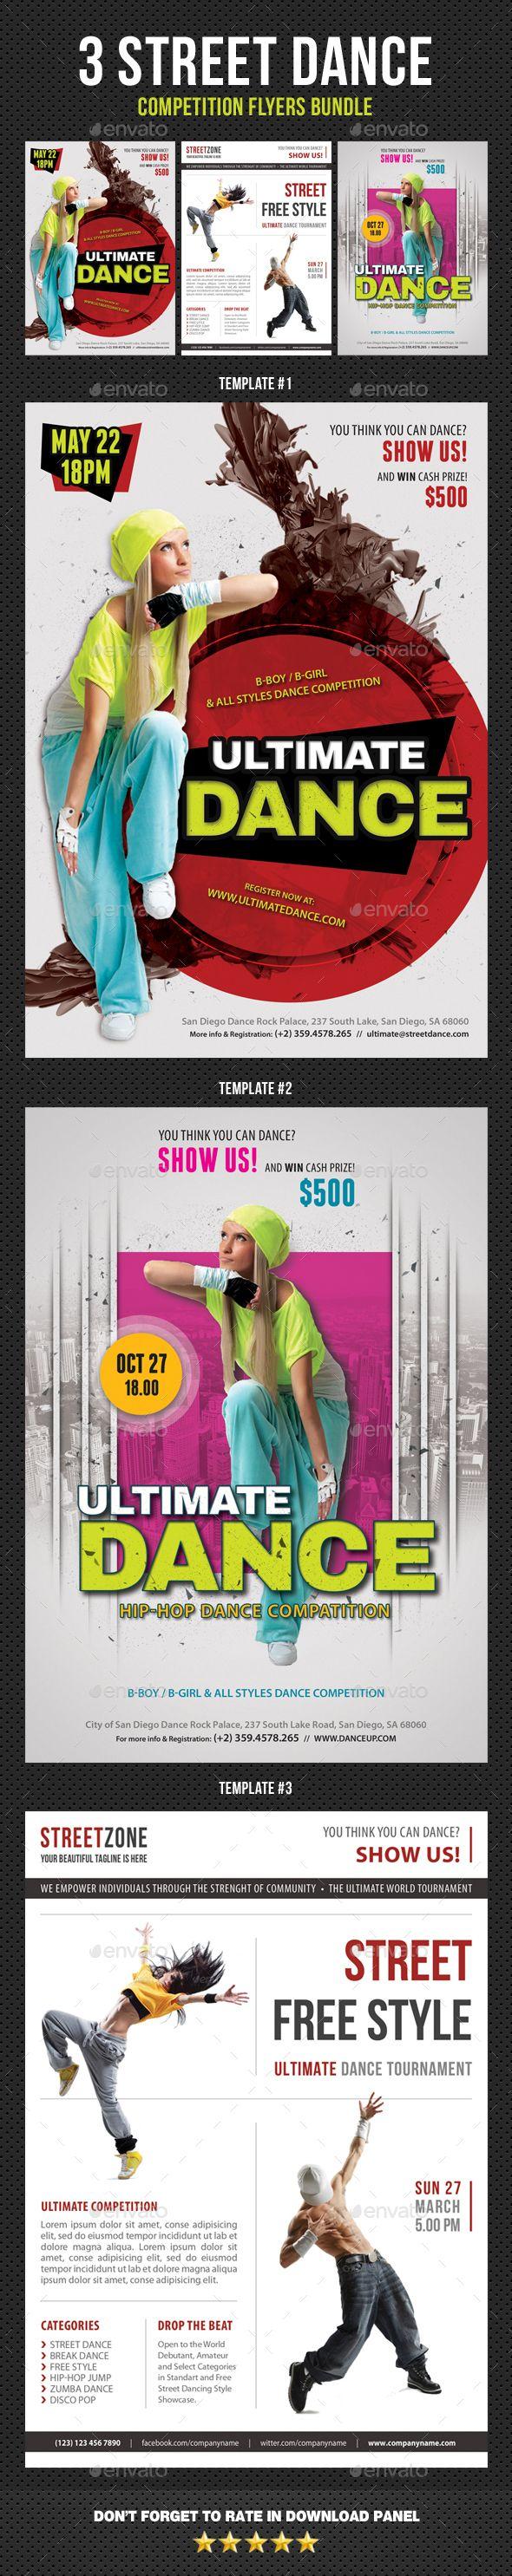 3 Street Dance Competition Flyer Bundle